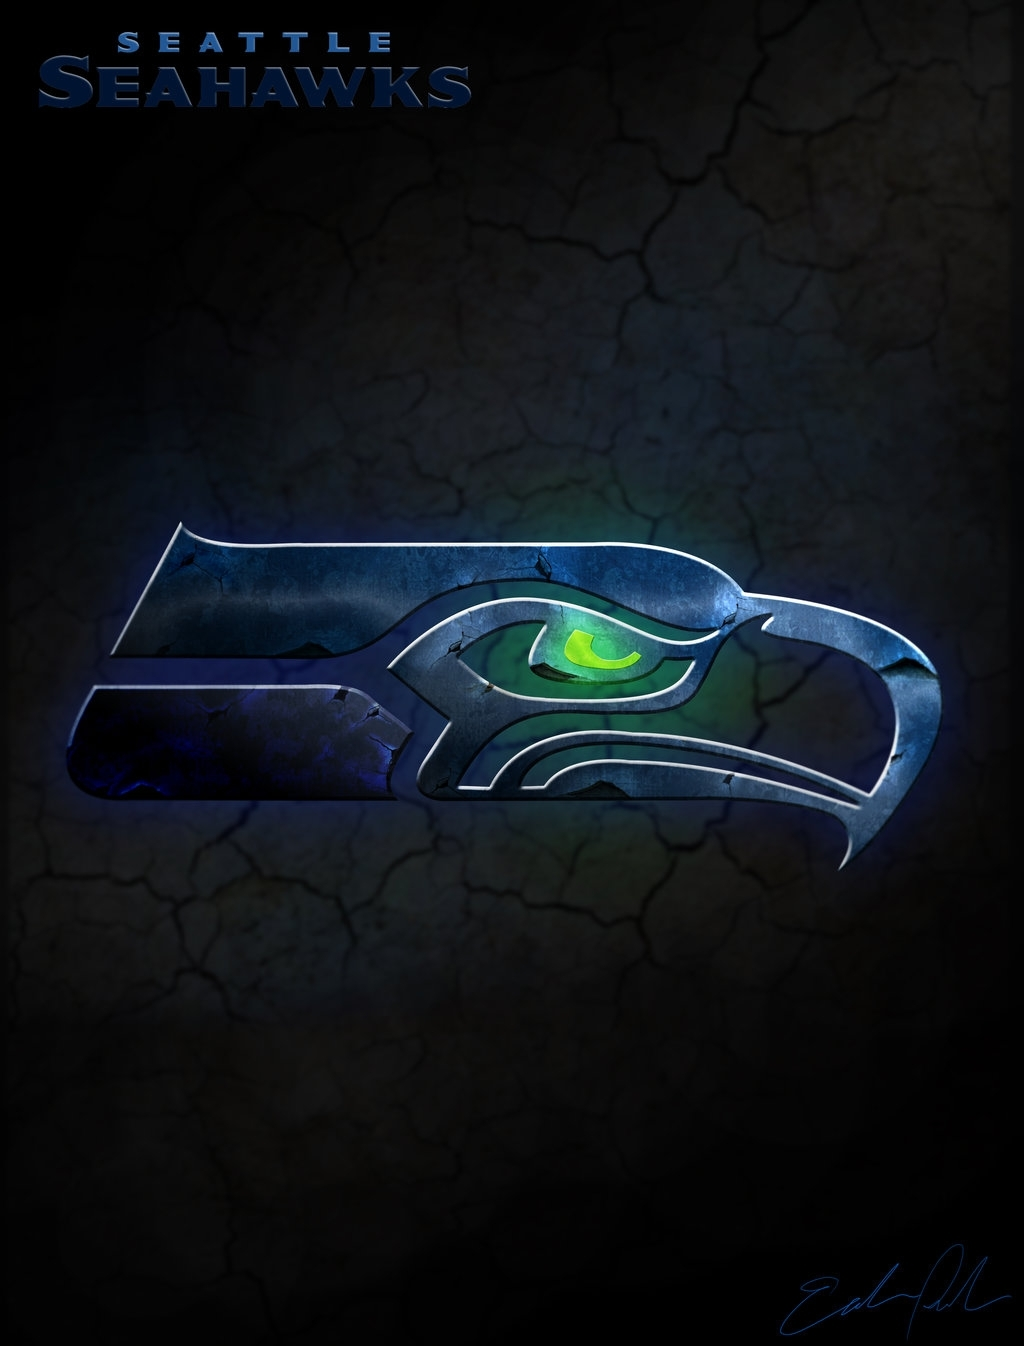 seahawks wallpaper - bdfjade